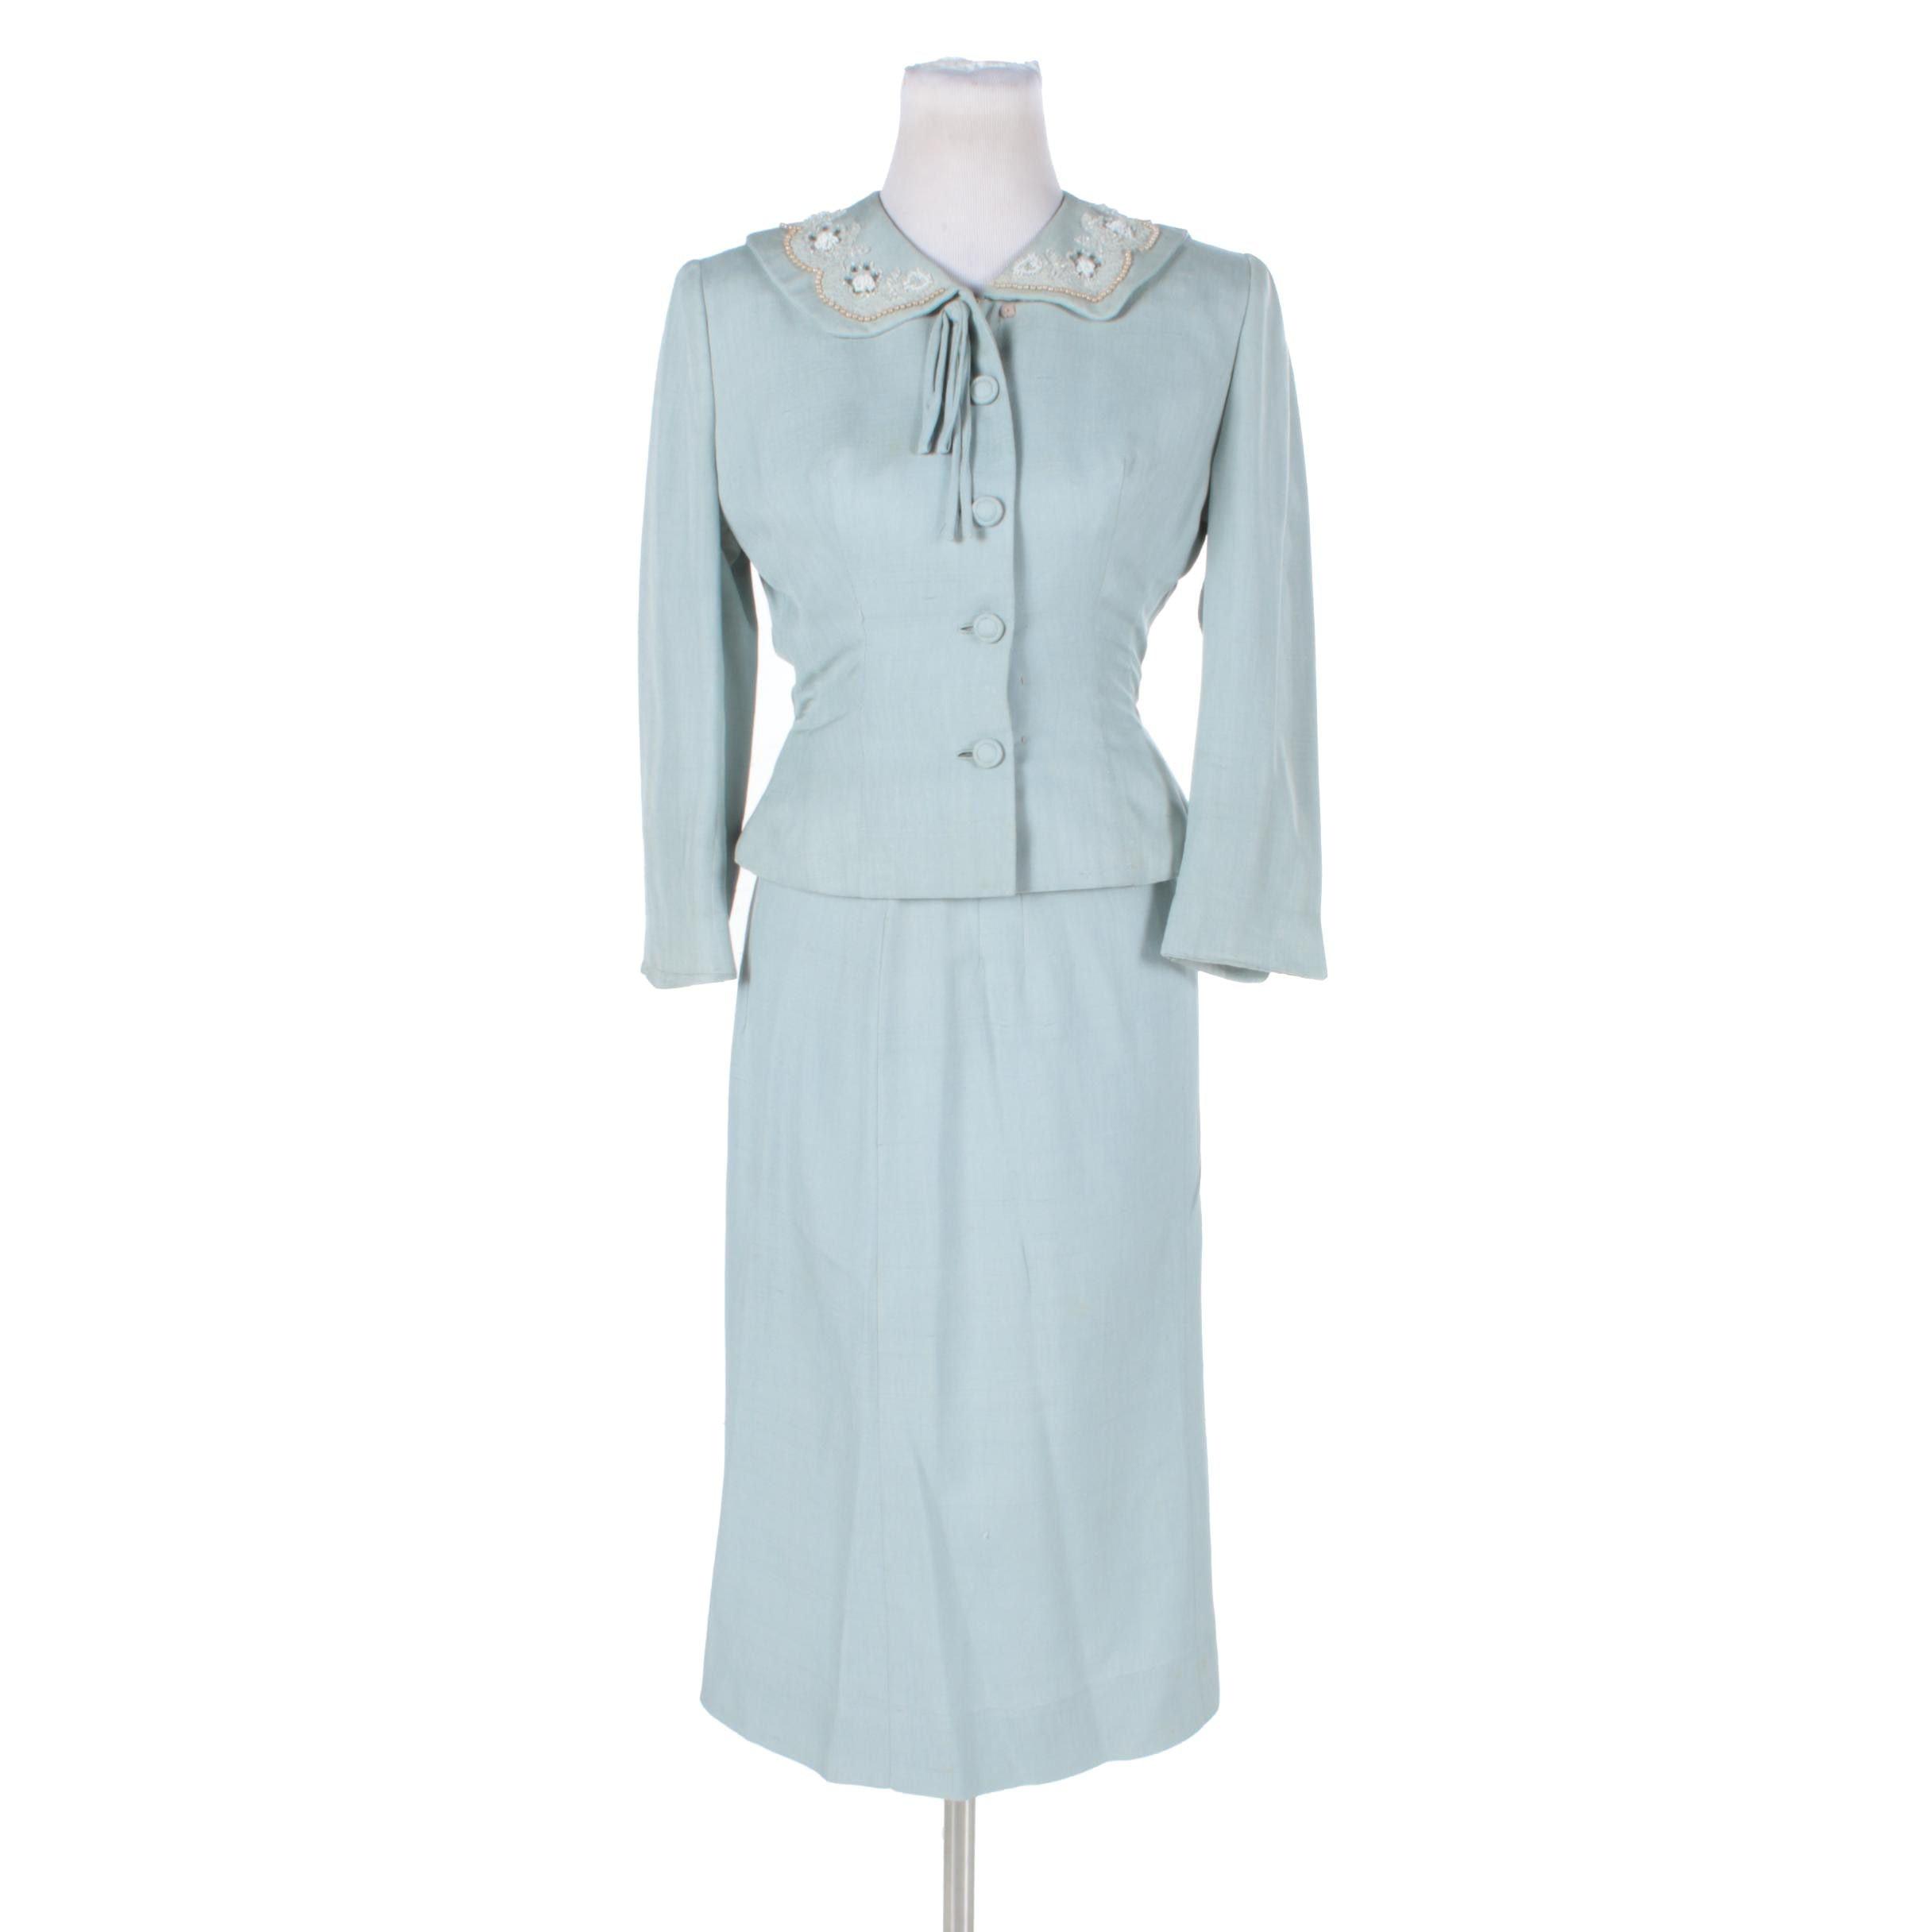 Circa 1940s Vintage Skirt Suit